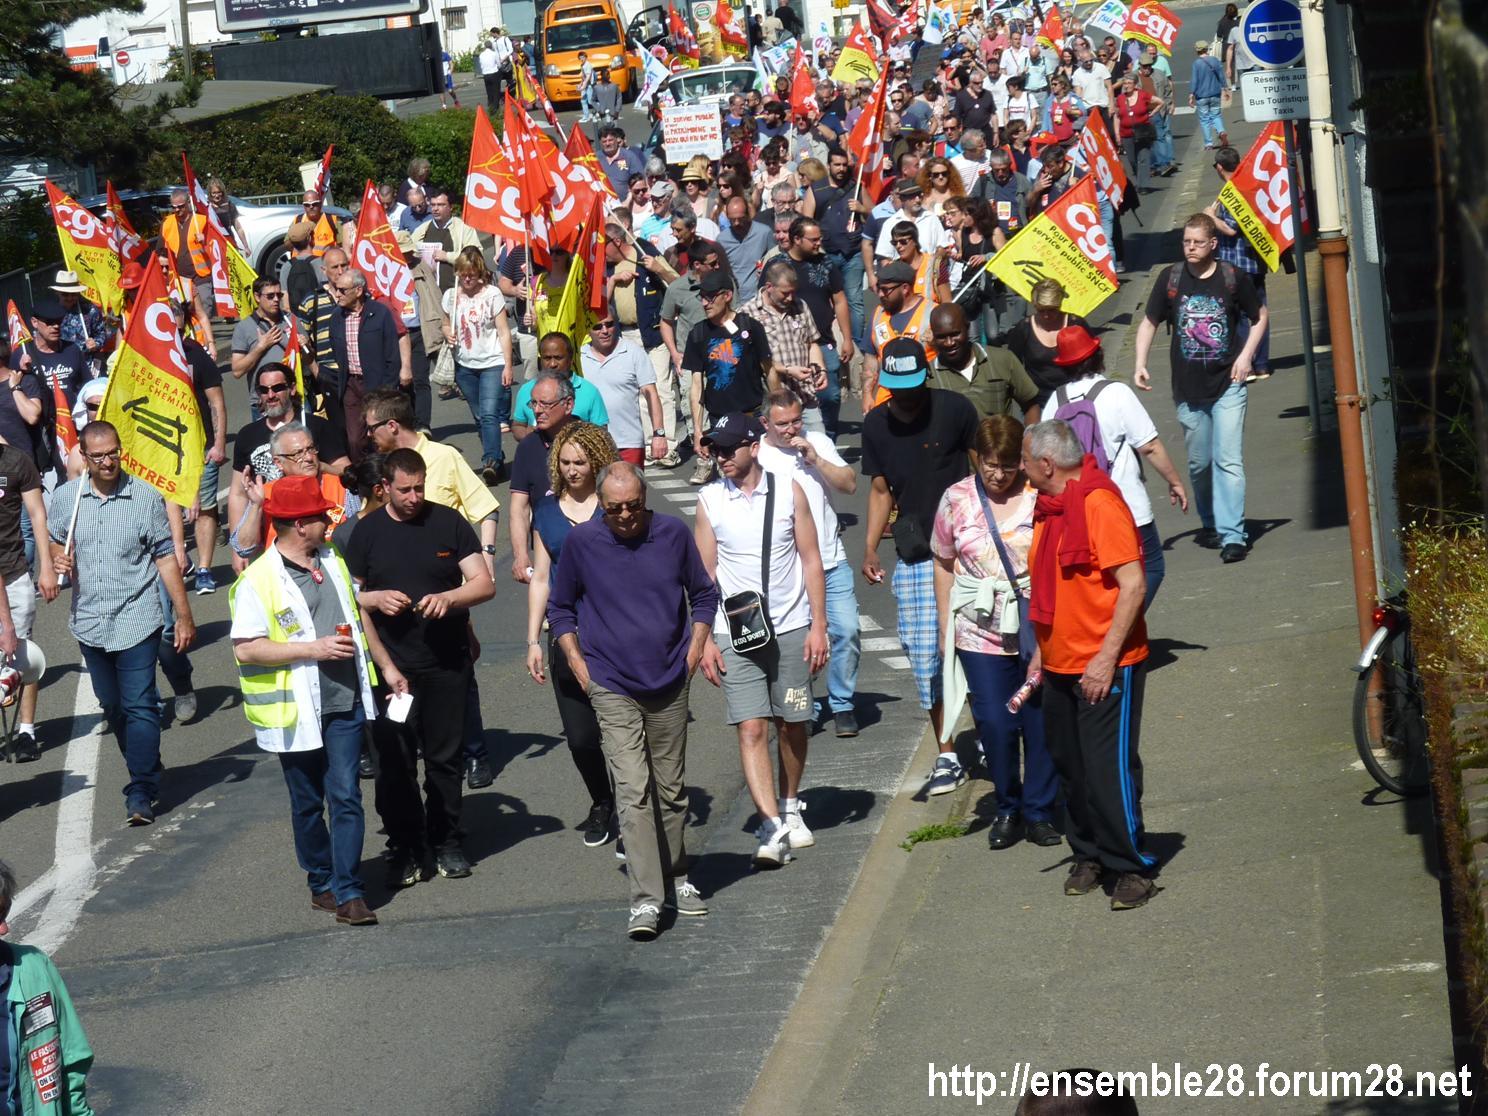 19-04-2018 Chartres Manifestation Interprofessionnelle CGT Solidaires SNES-FSU n°12